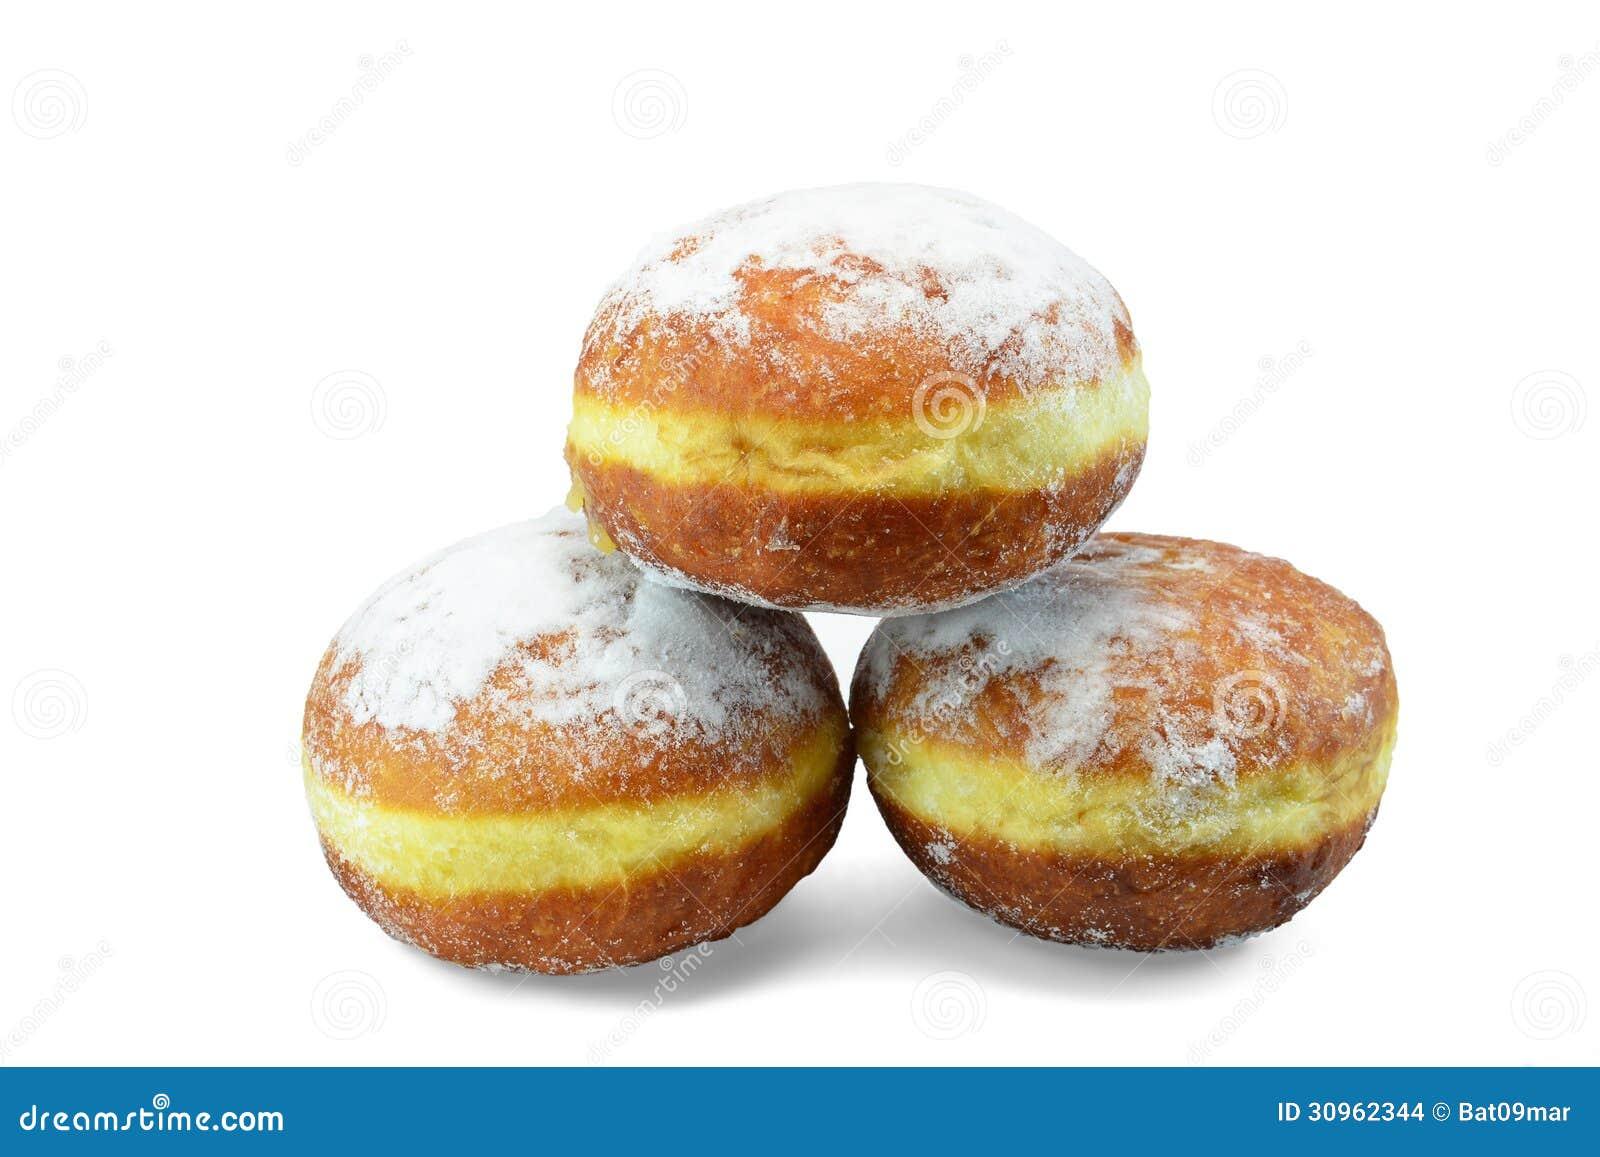 Doughnuts With Vanilla Custard - Gogosi Stock Images - Image: 30962344